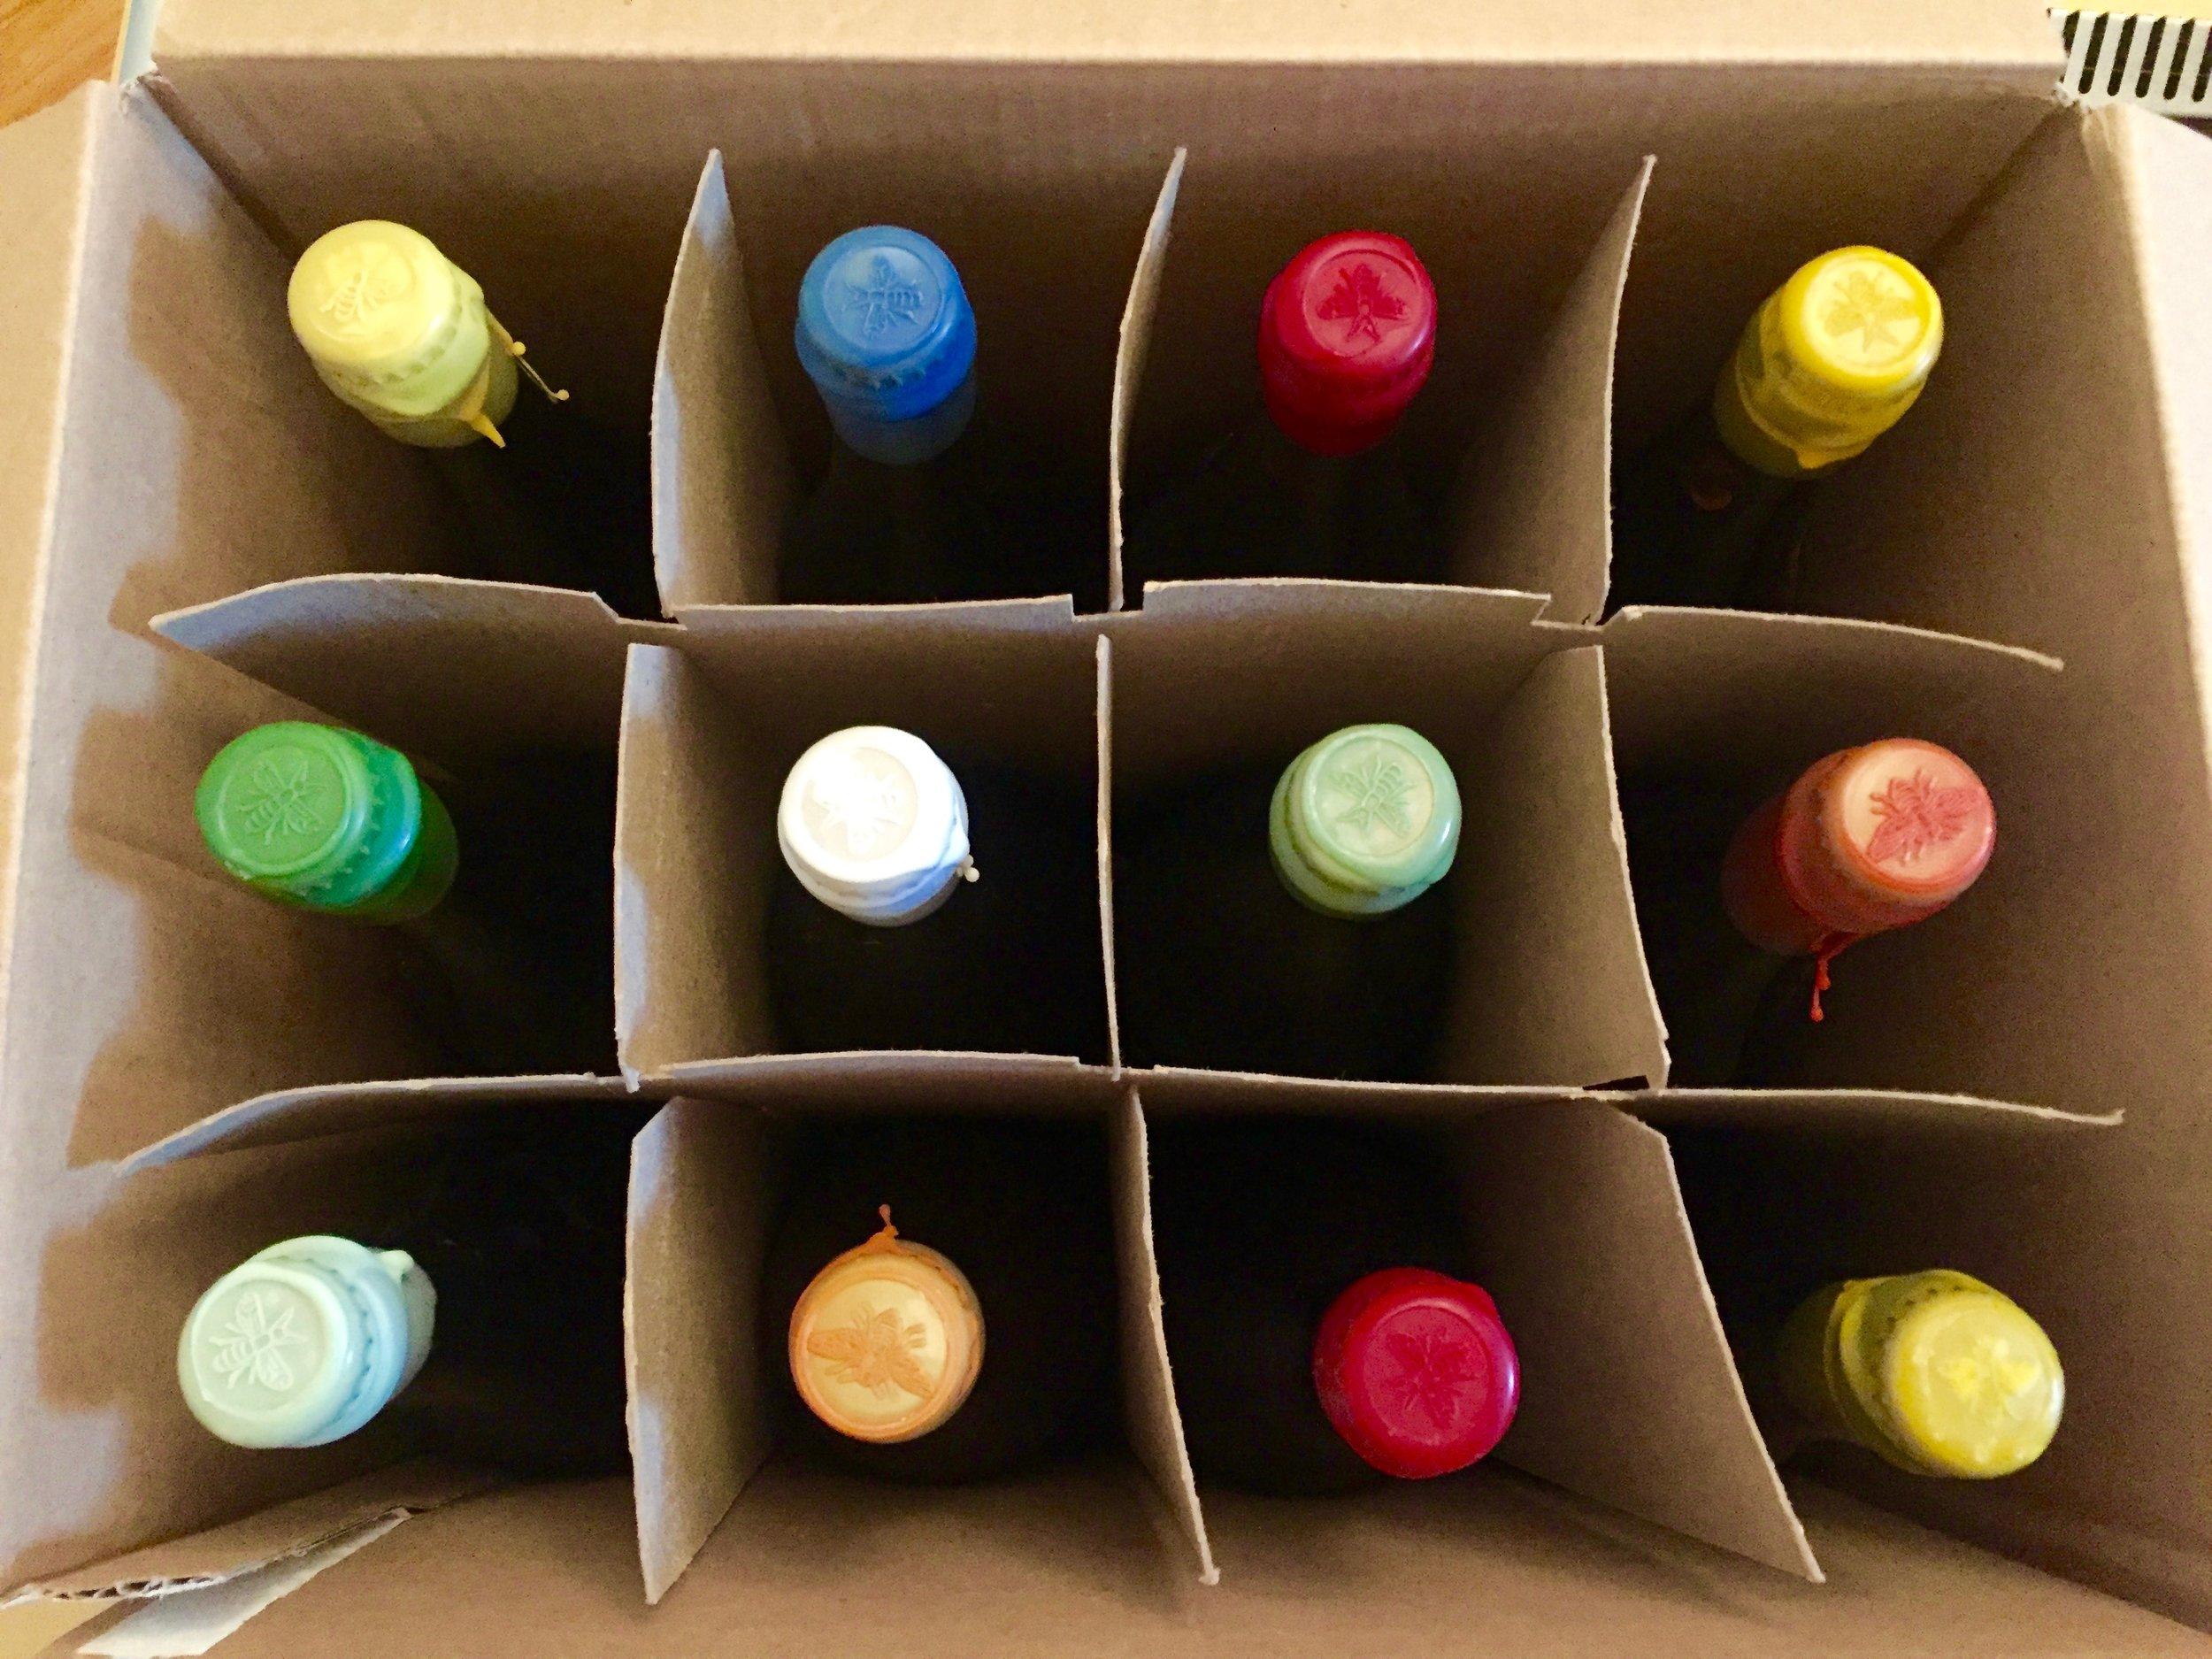 Plan Bee wax-topped bottles